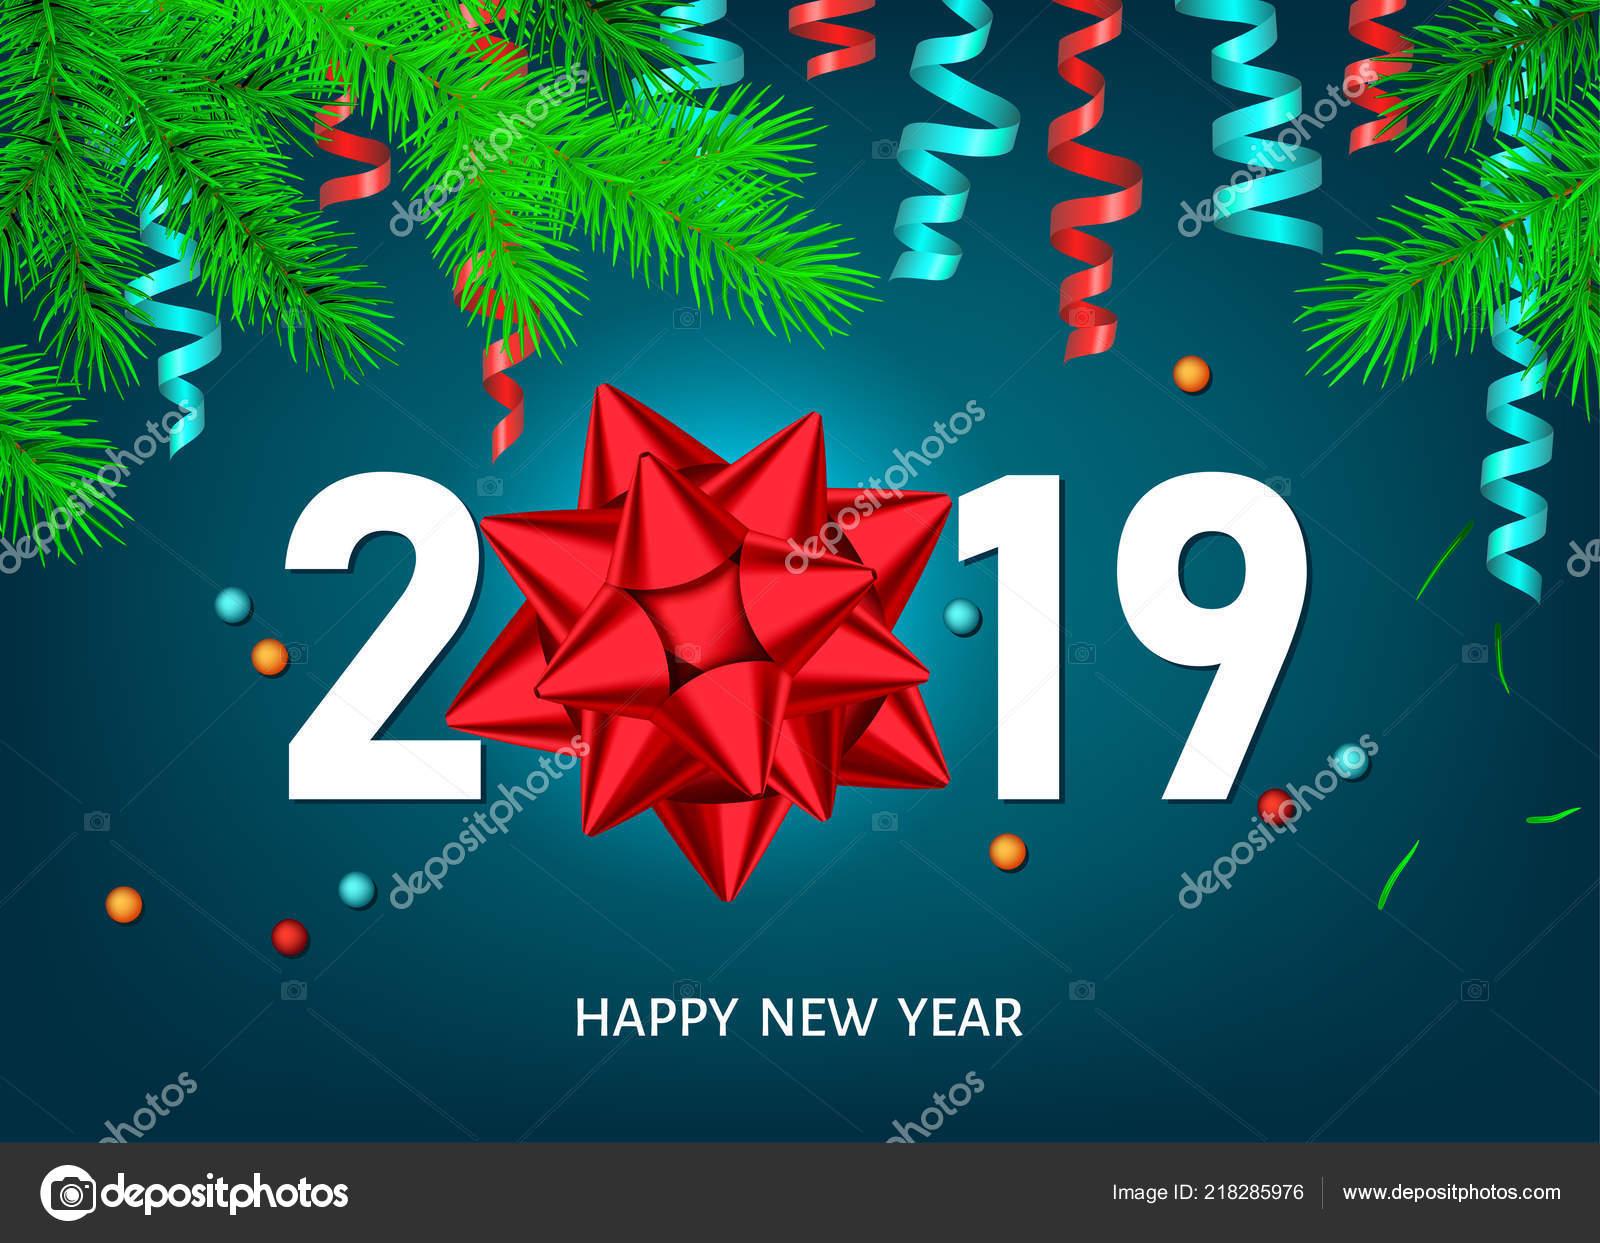 Photos De Joyeux Noel Et Bonne Annee.Joyeux Noel Bonne Annee 2019 Fond Avec Branche Bow Ruban